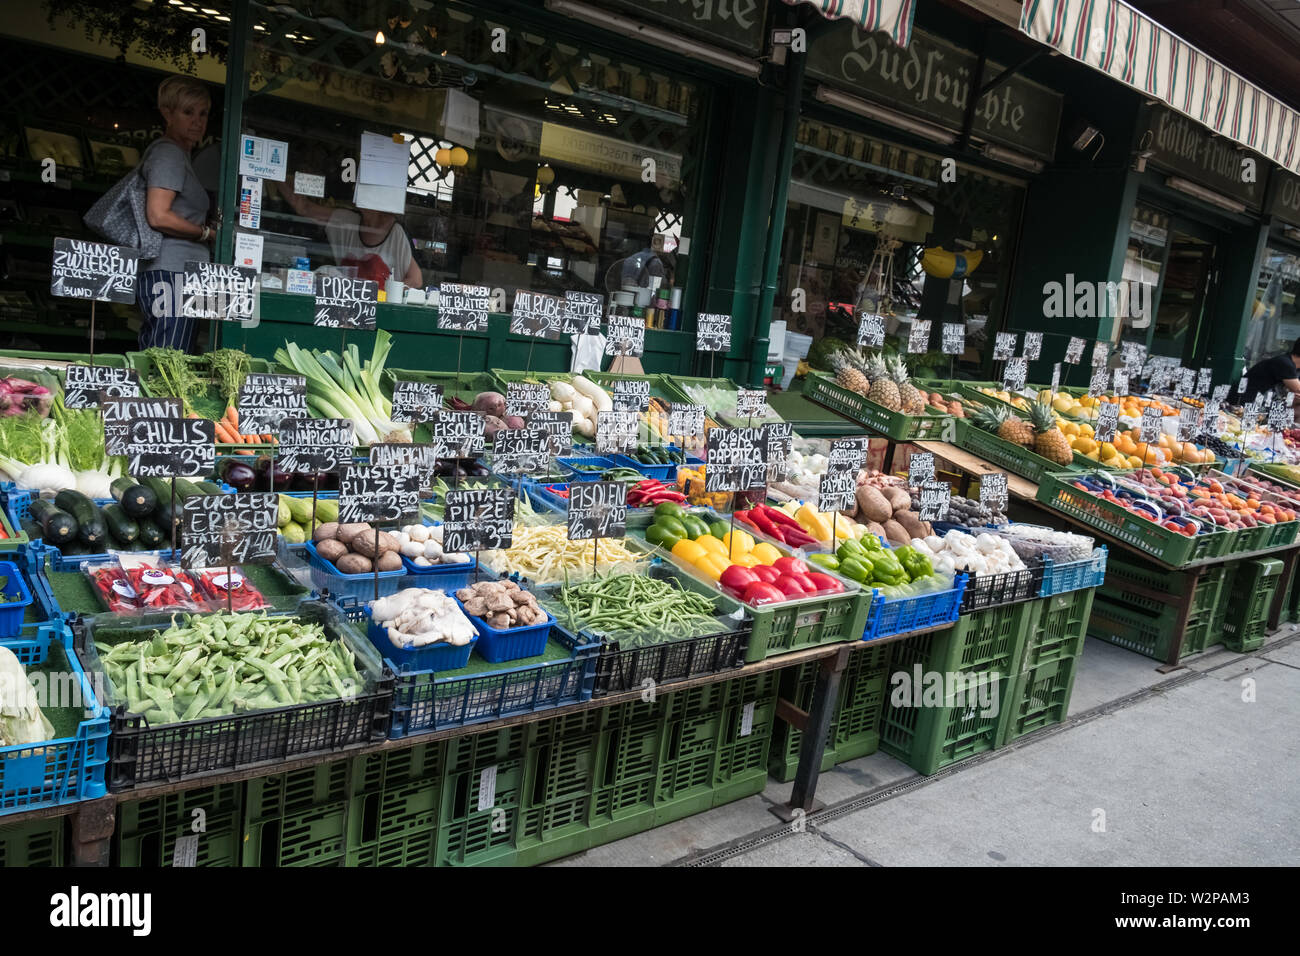 Display of fresh fruit and vegetables for sale at Naschmarkt, a popular market destination in Vienna, Austria - Stock Image